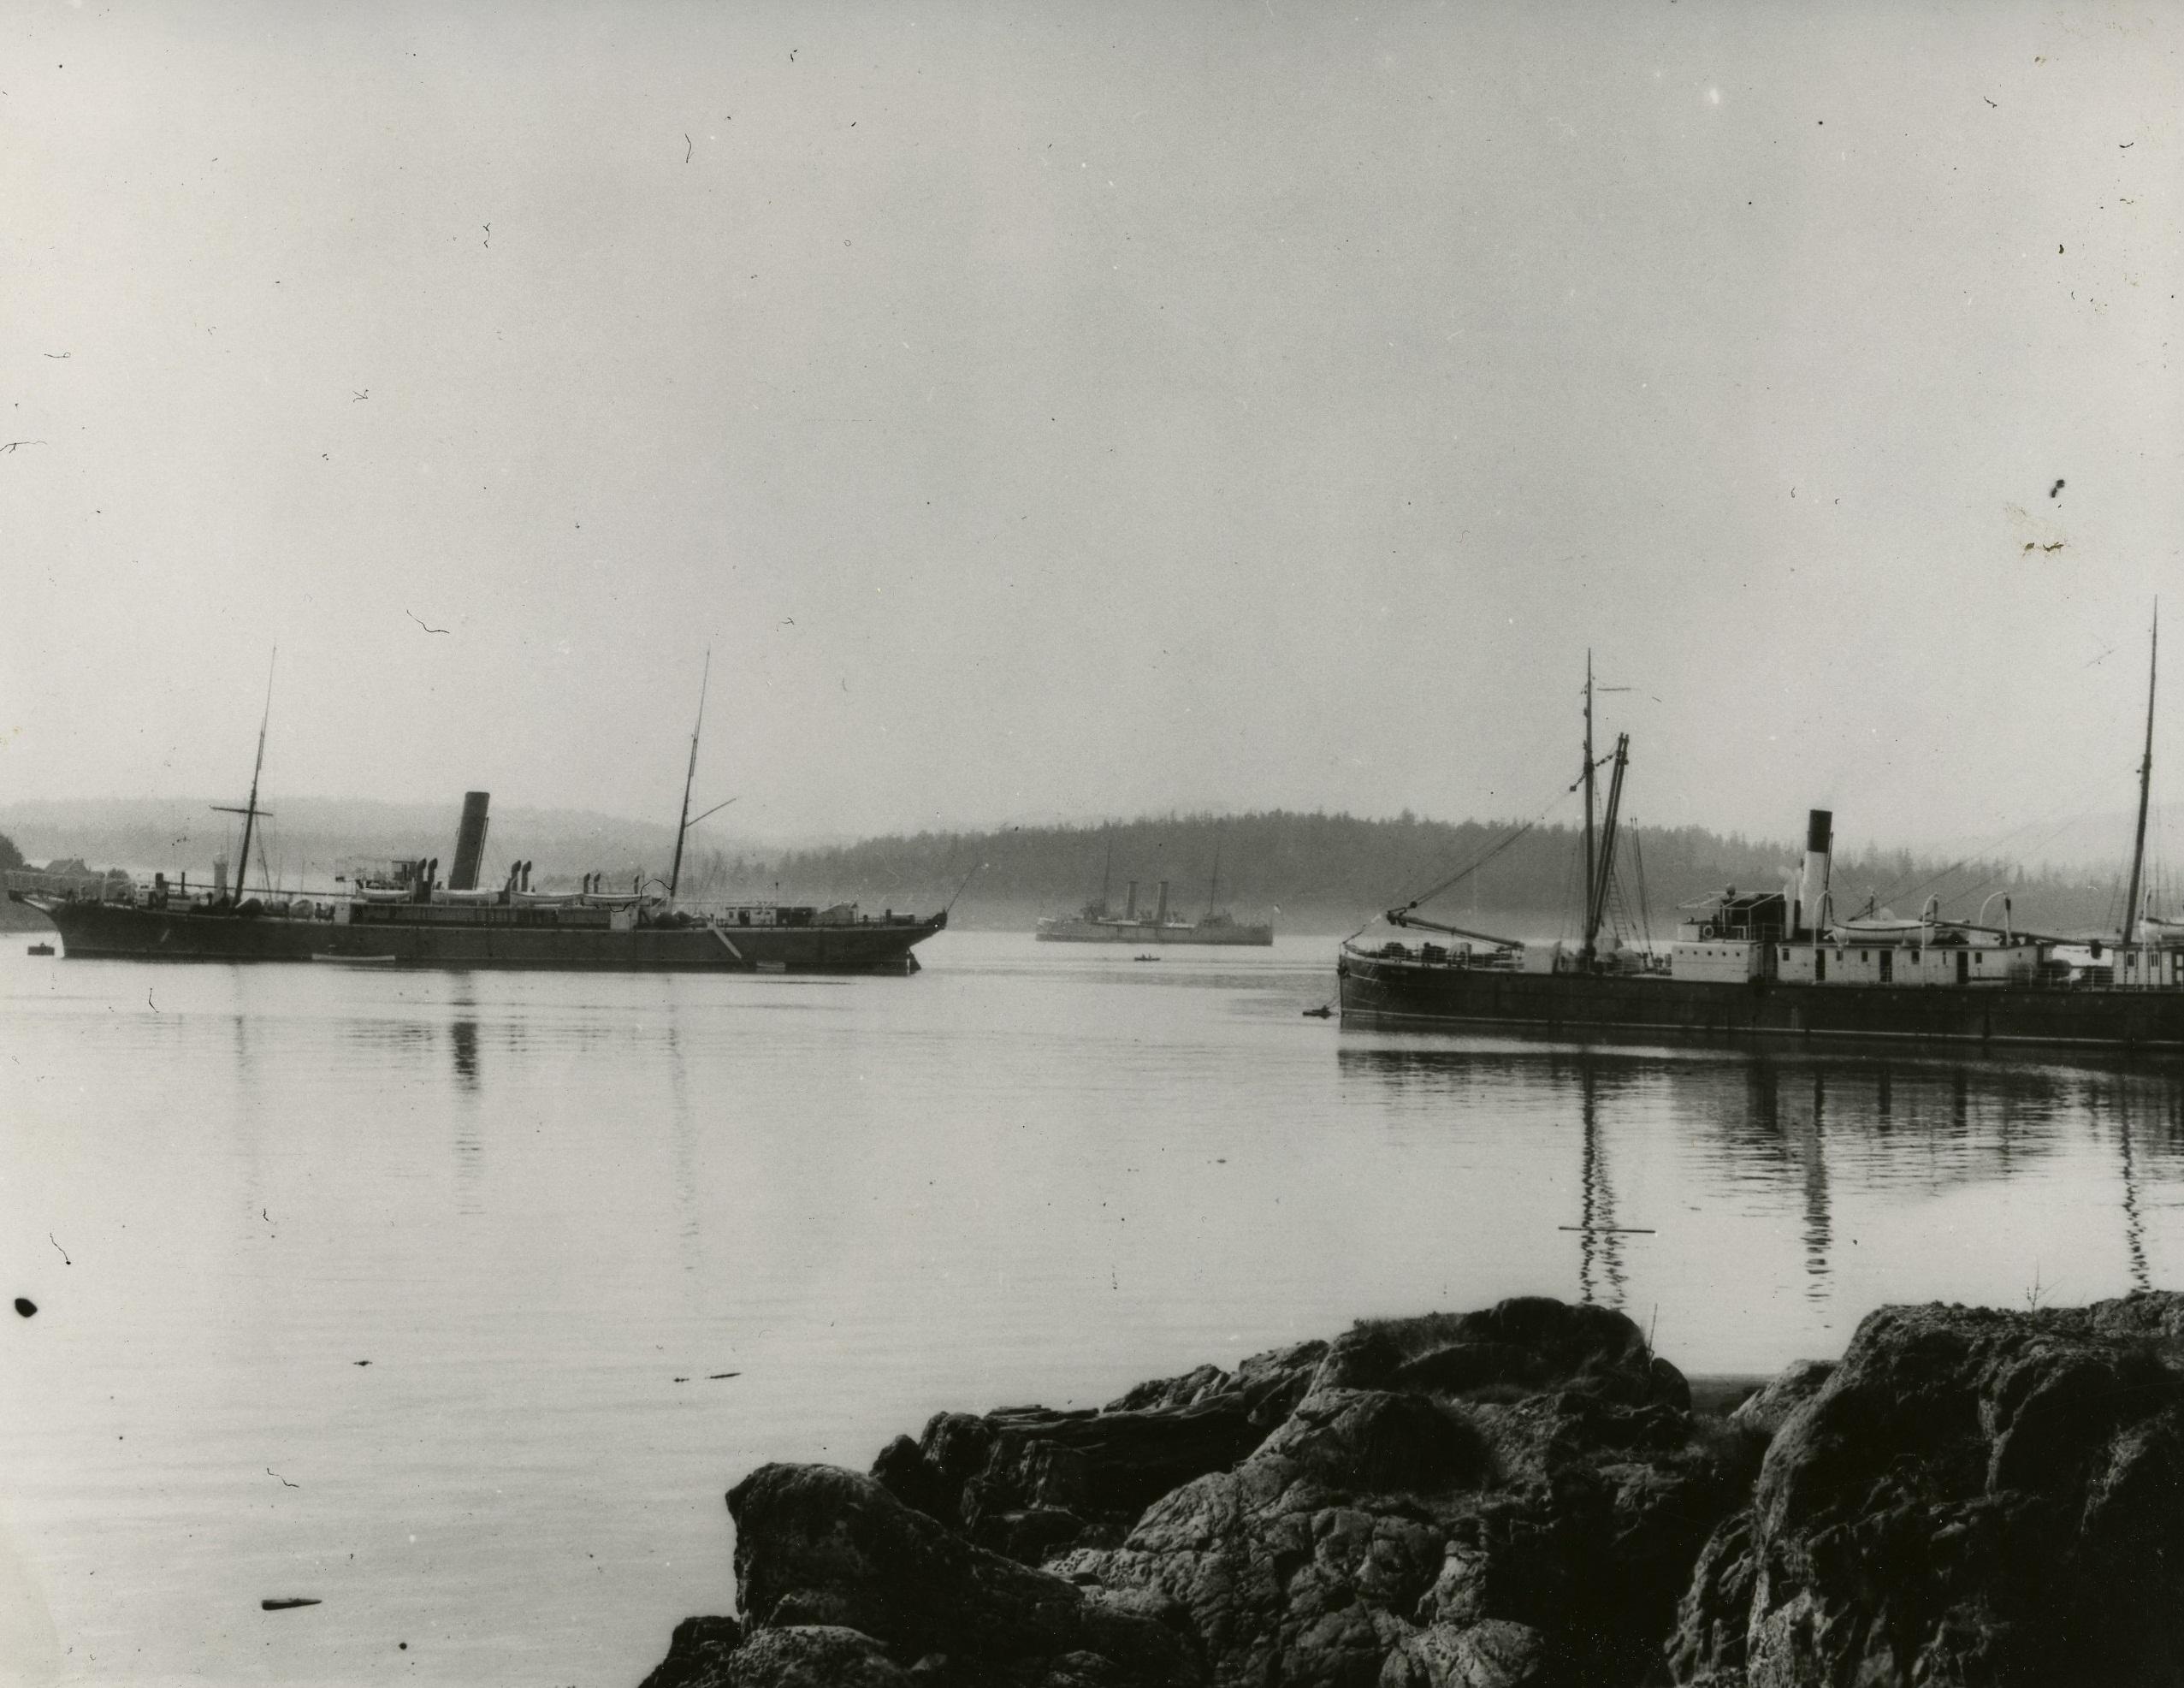 Salvor, HMCS Rainbow, and Restorer